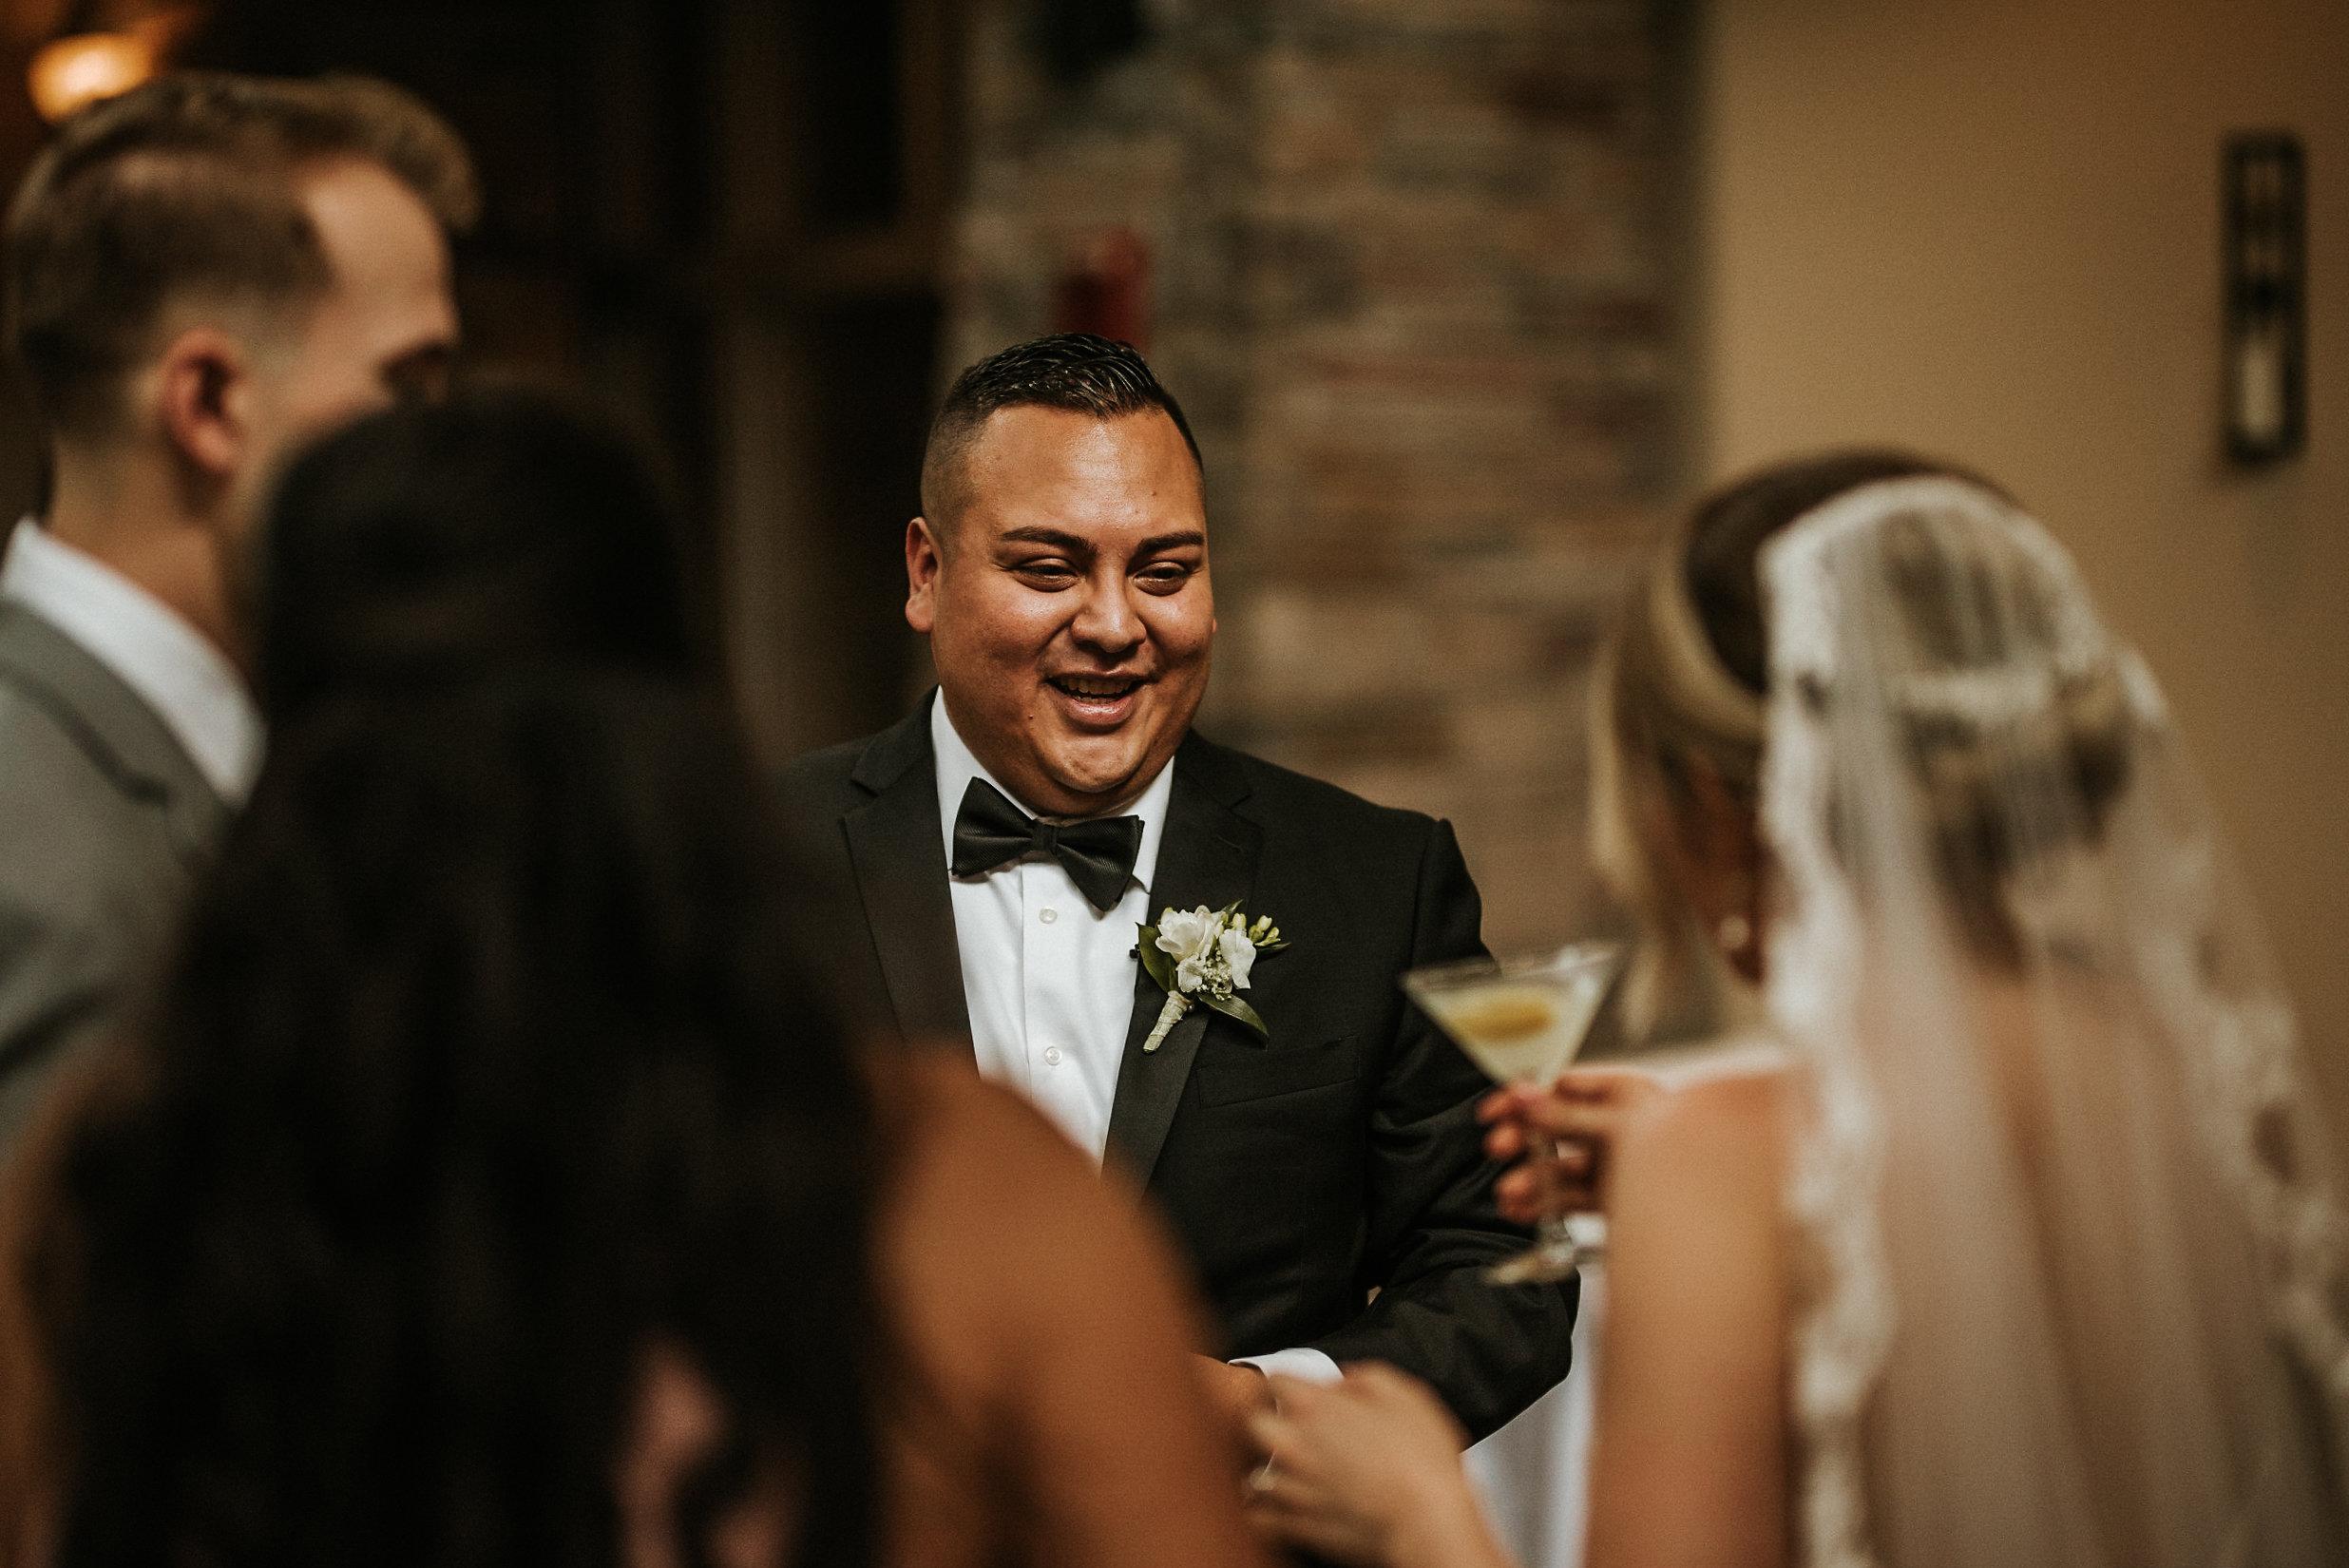 Groom talking to wedding guests